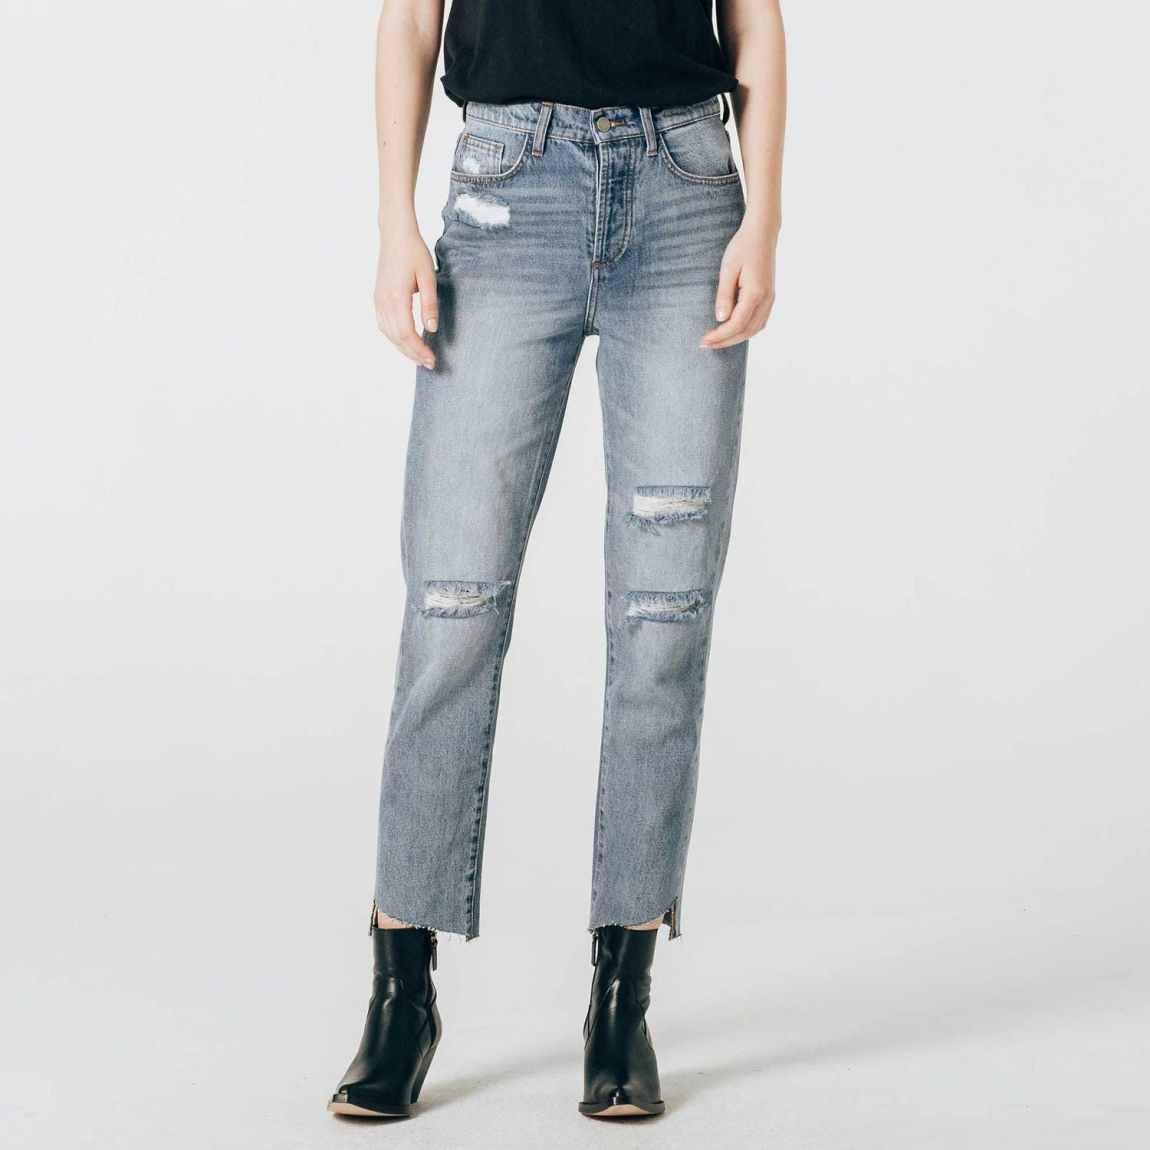 dstld, dstld jeans, boyfriend jeans, vintage jeans, frayed hem, slouchy jeans, straight jeans, high rise jeans, distressed jeans